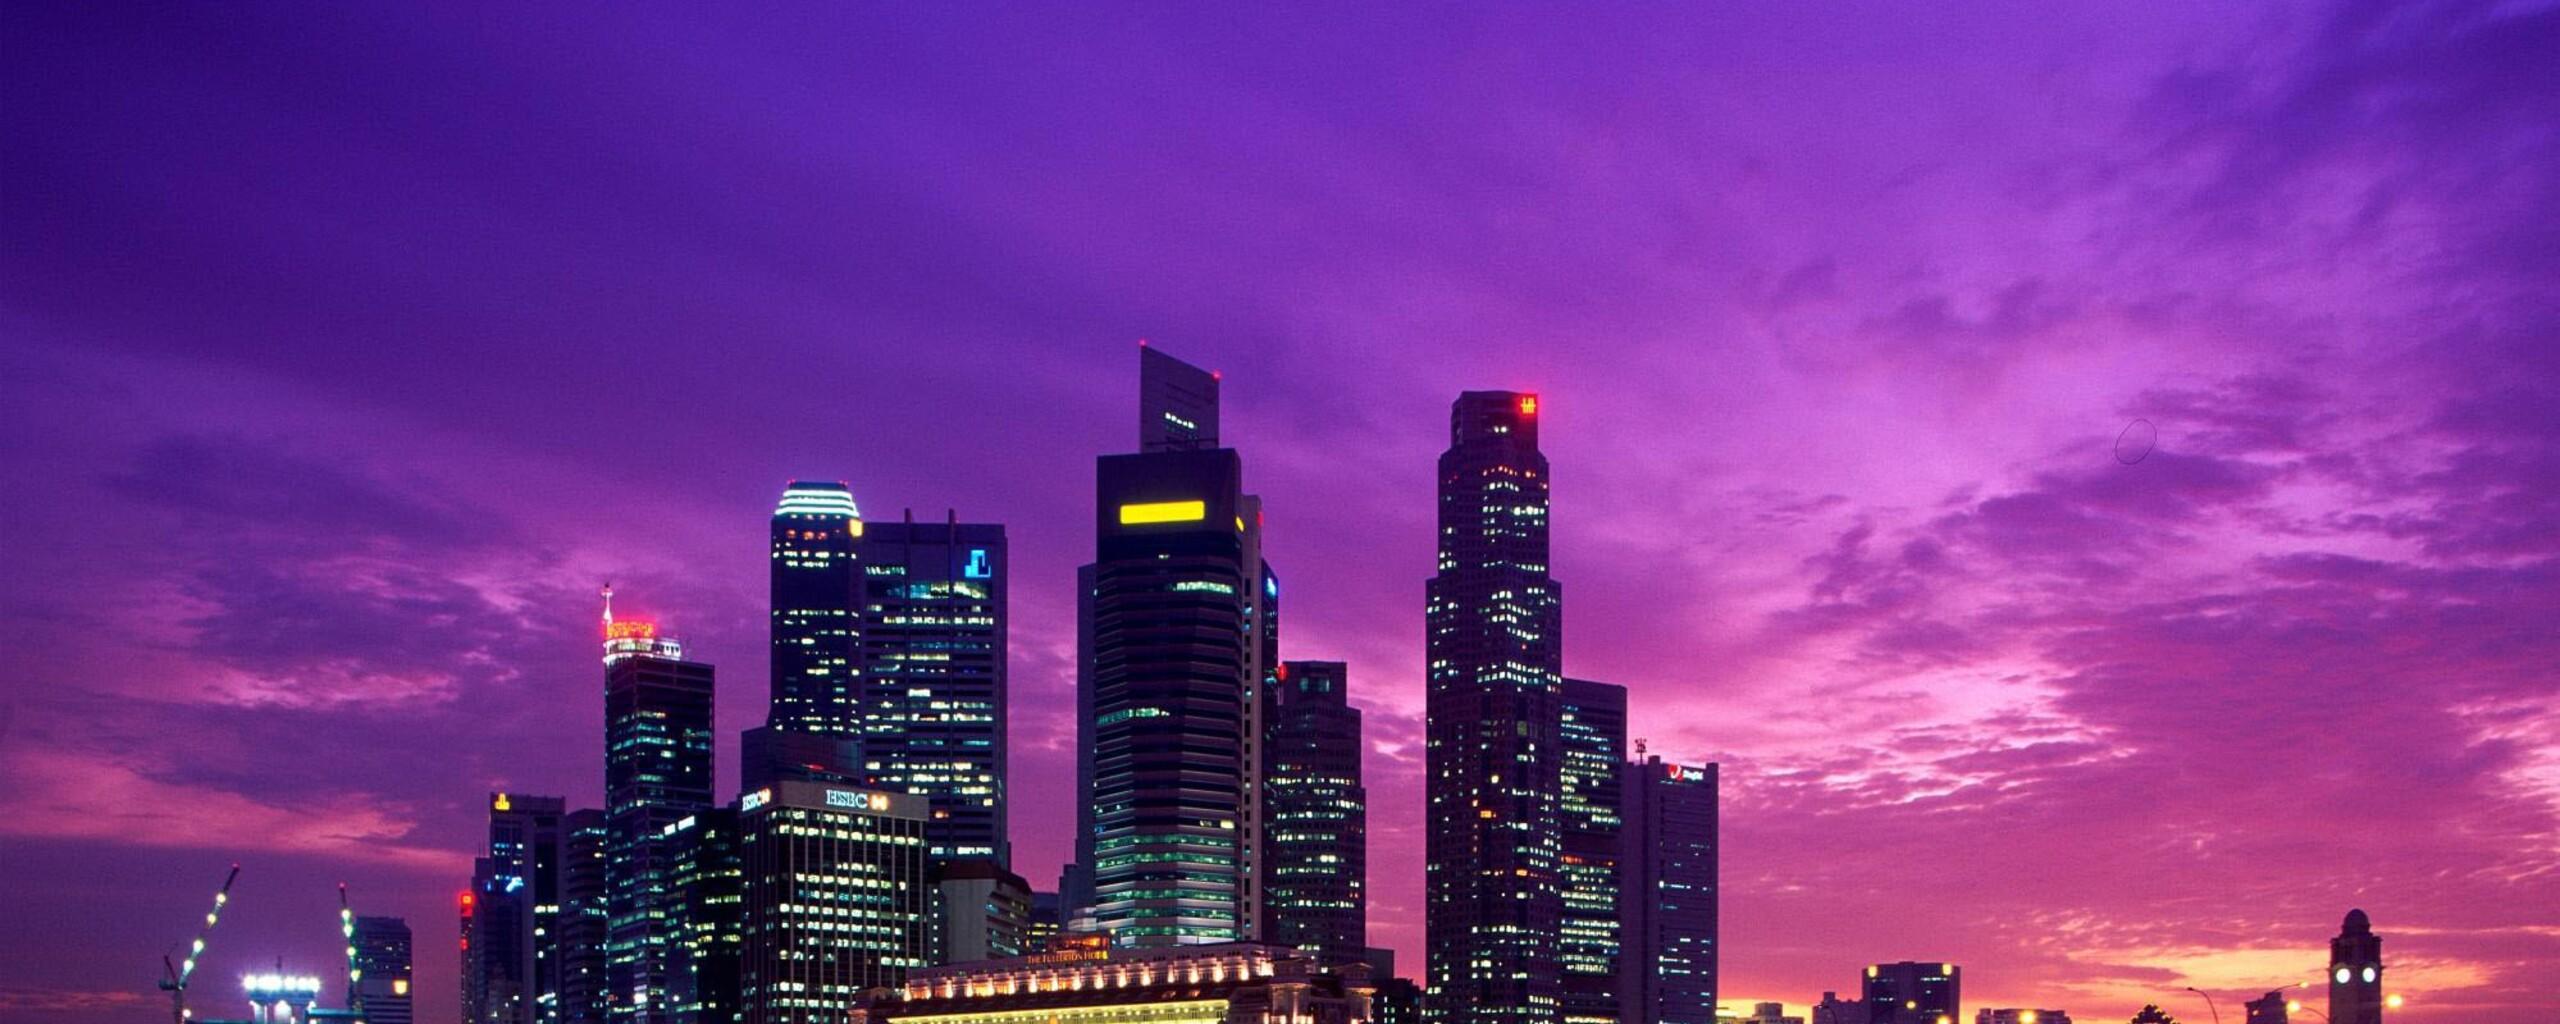 singapore-city-skycrapper-image.jpg